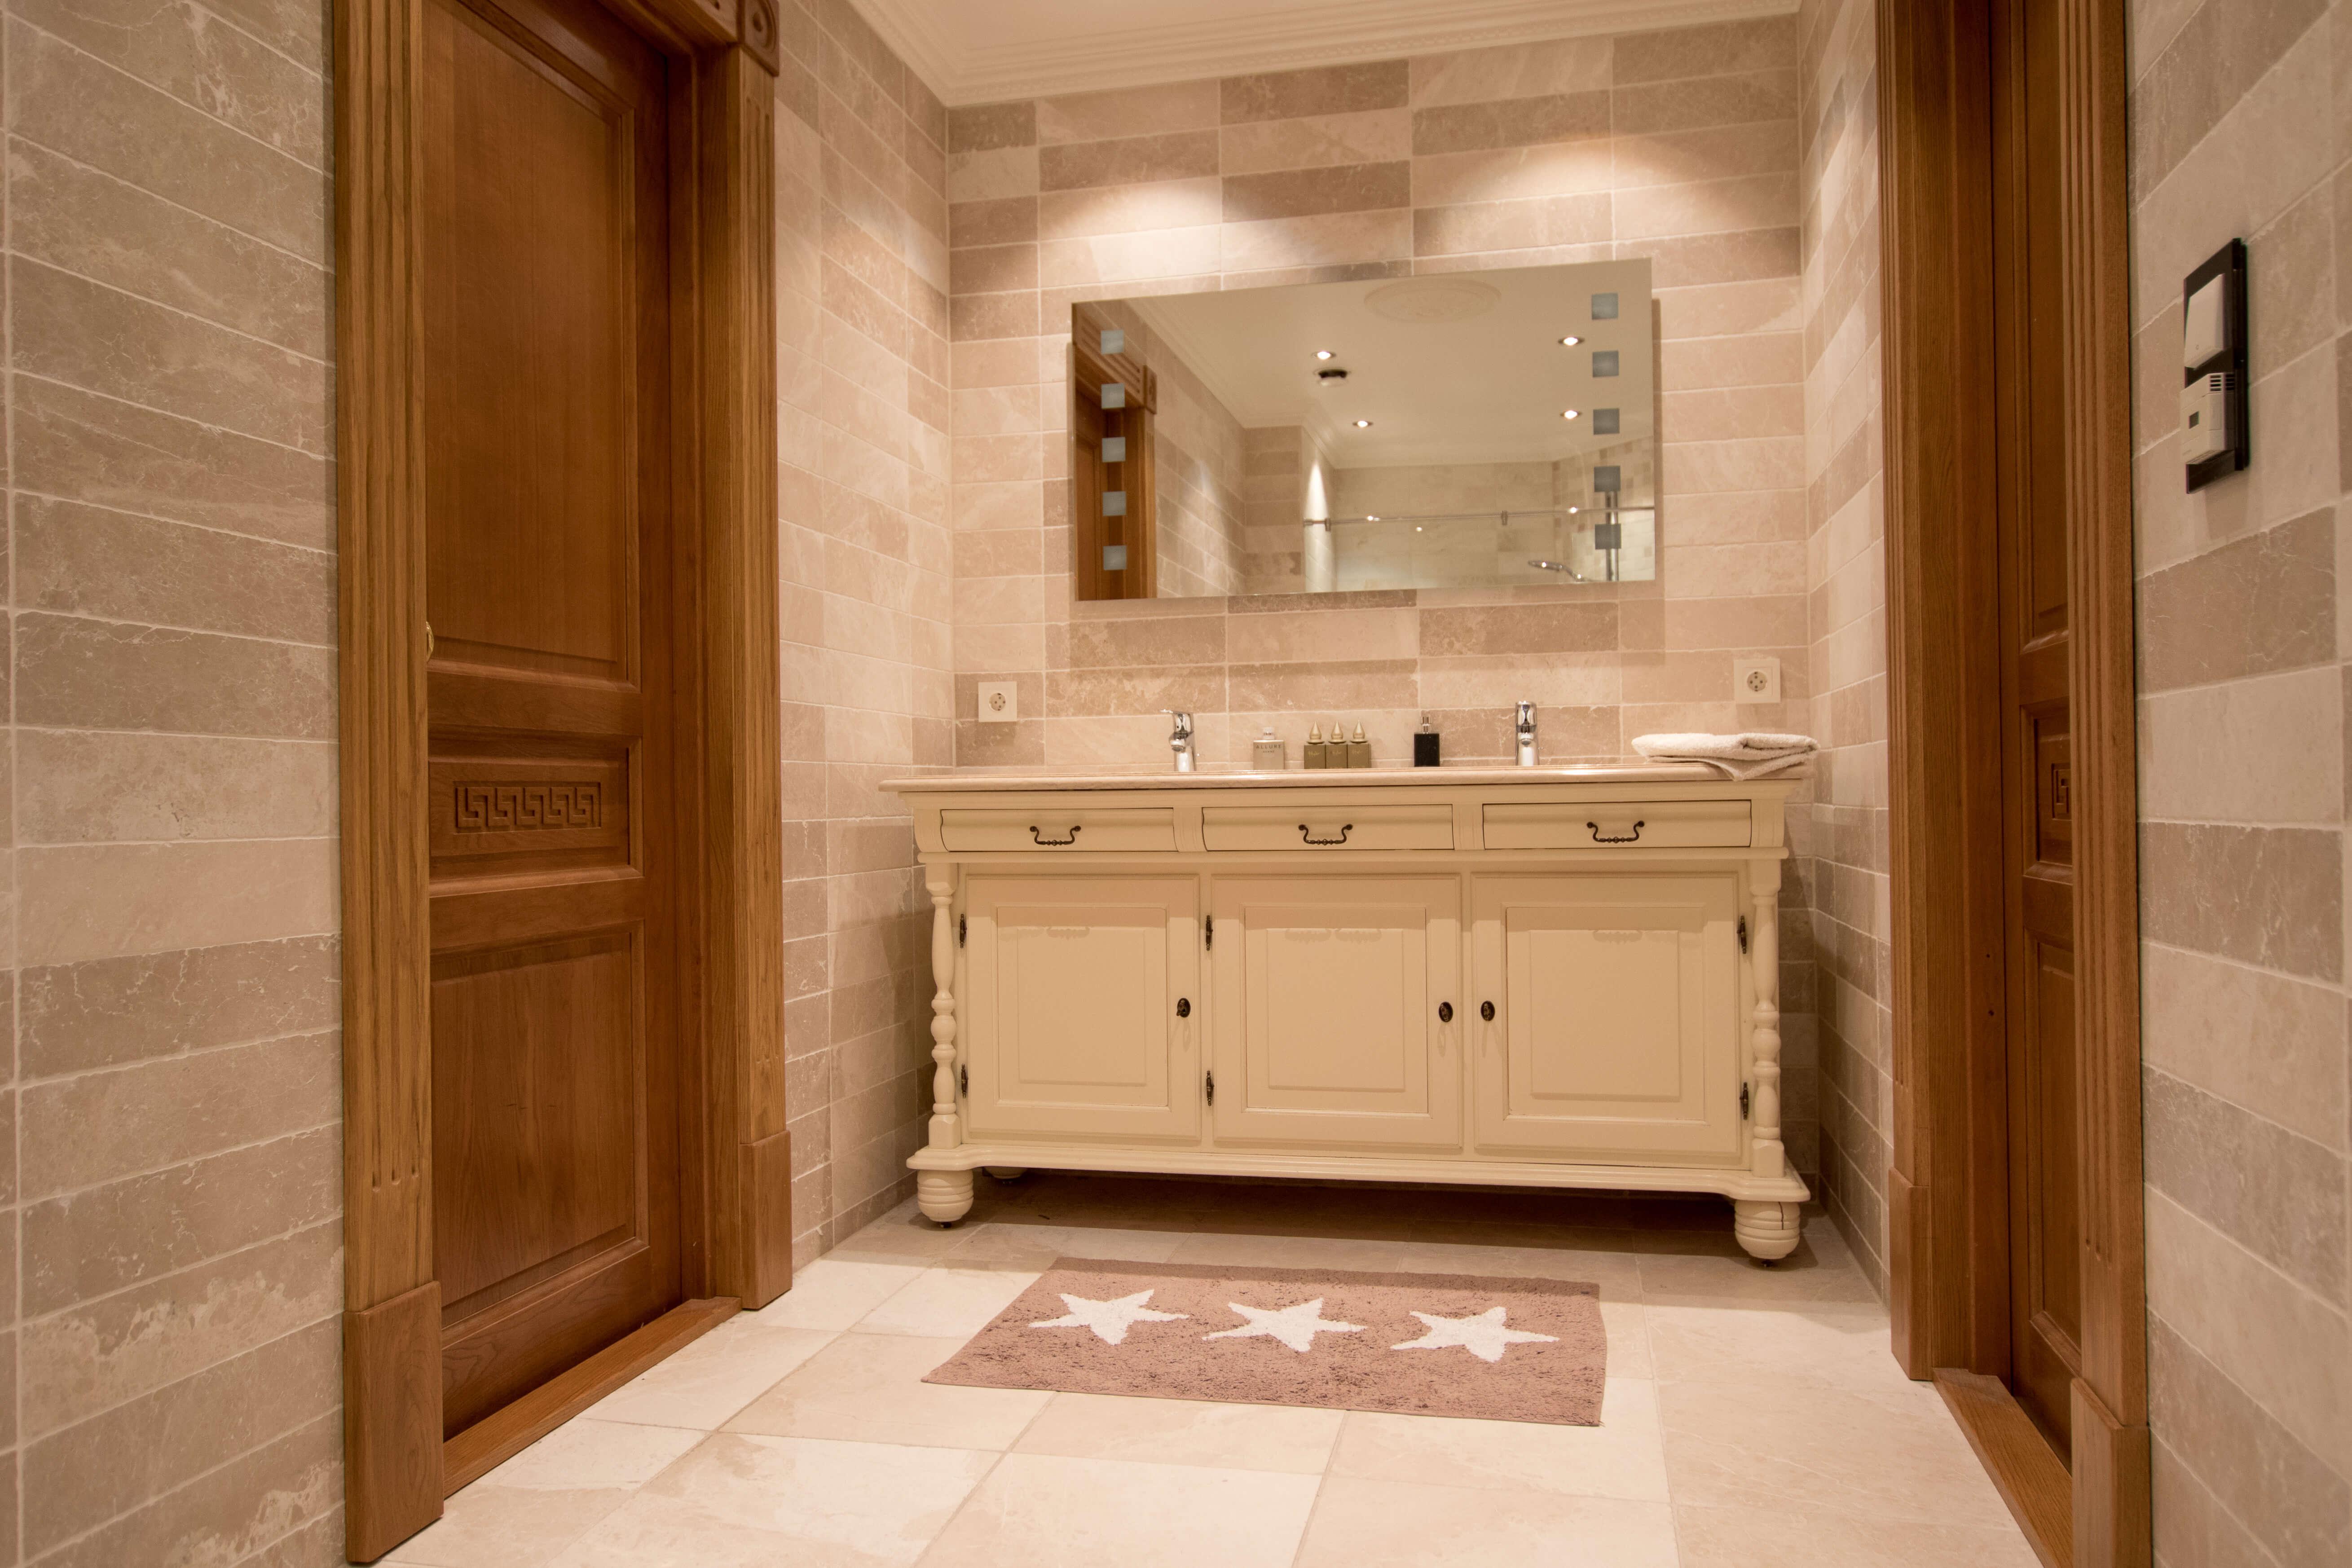 High quality bathroom for high quality living.